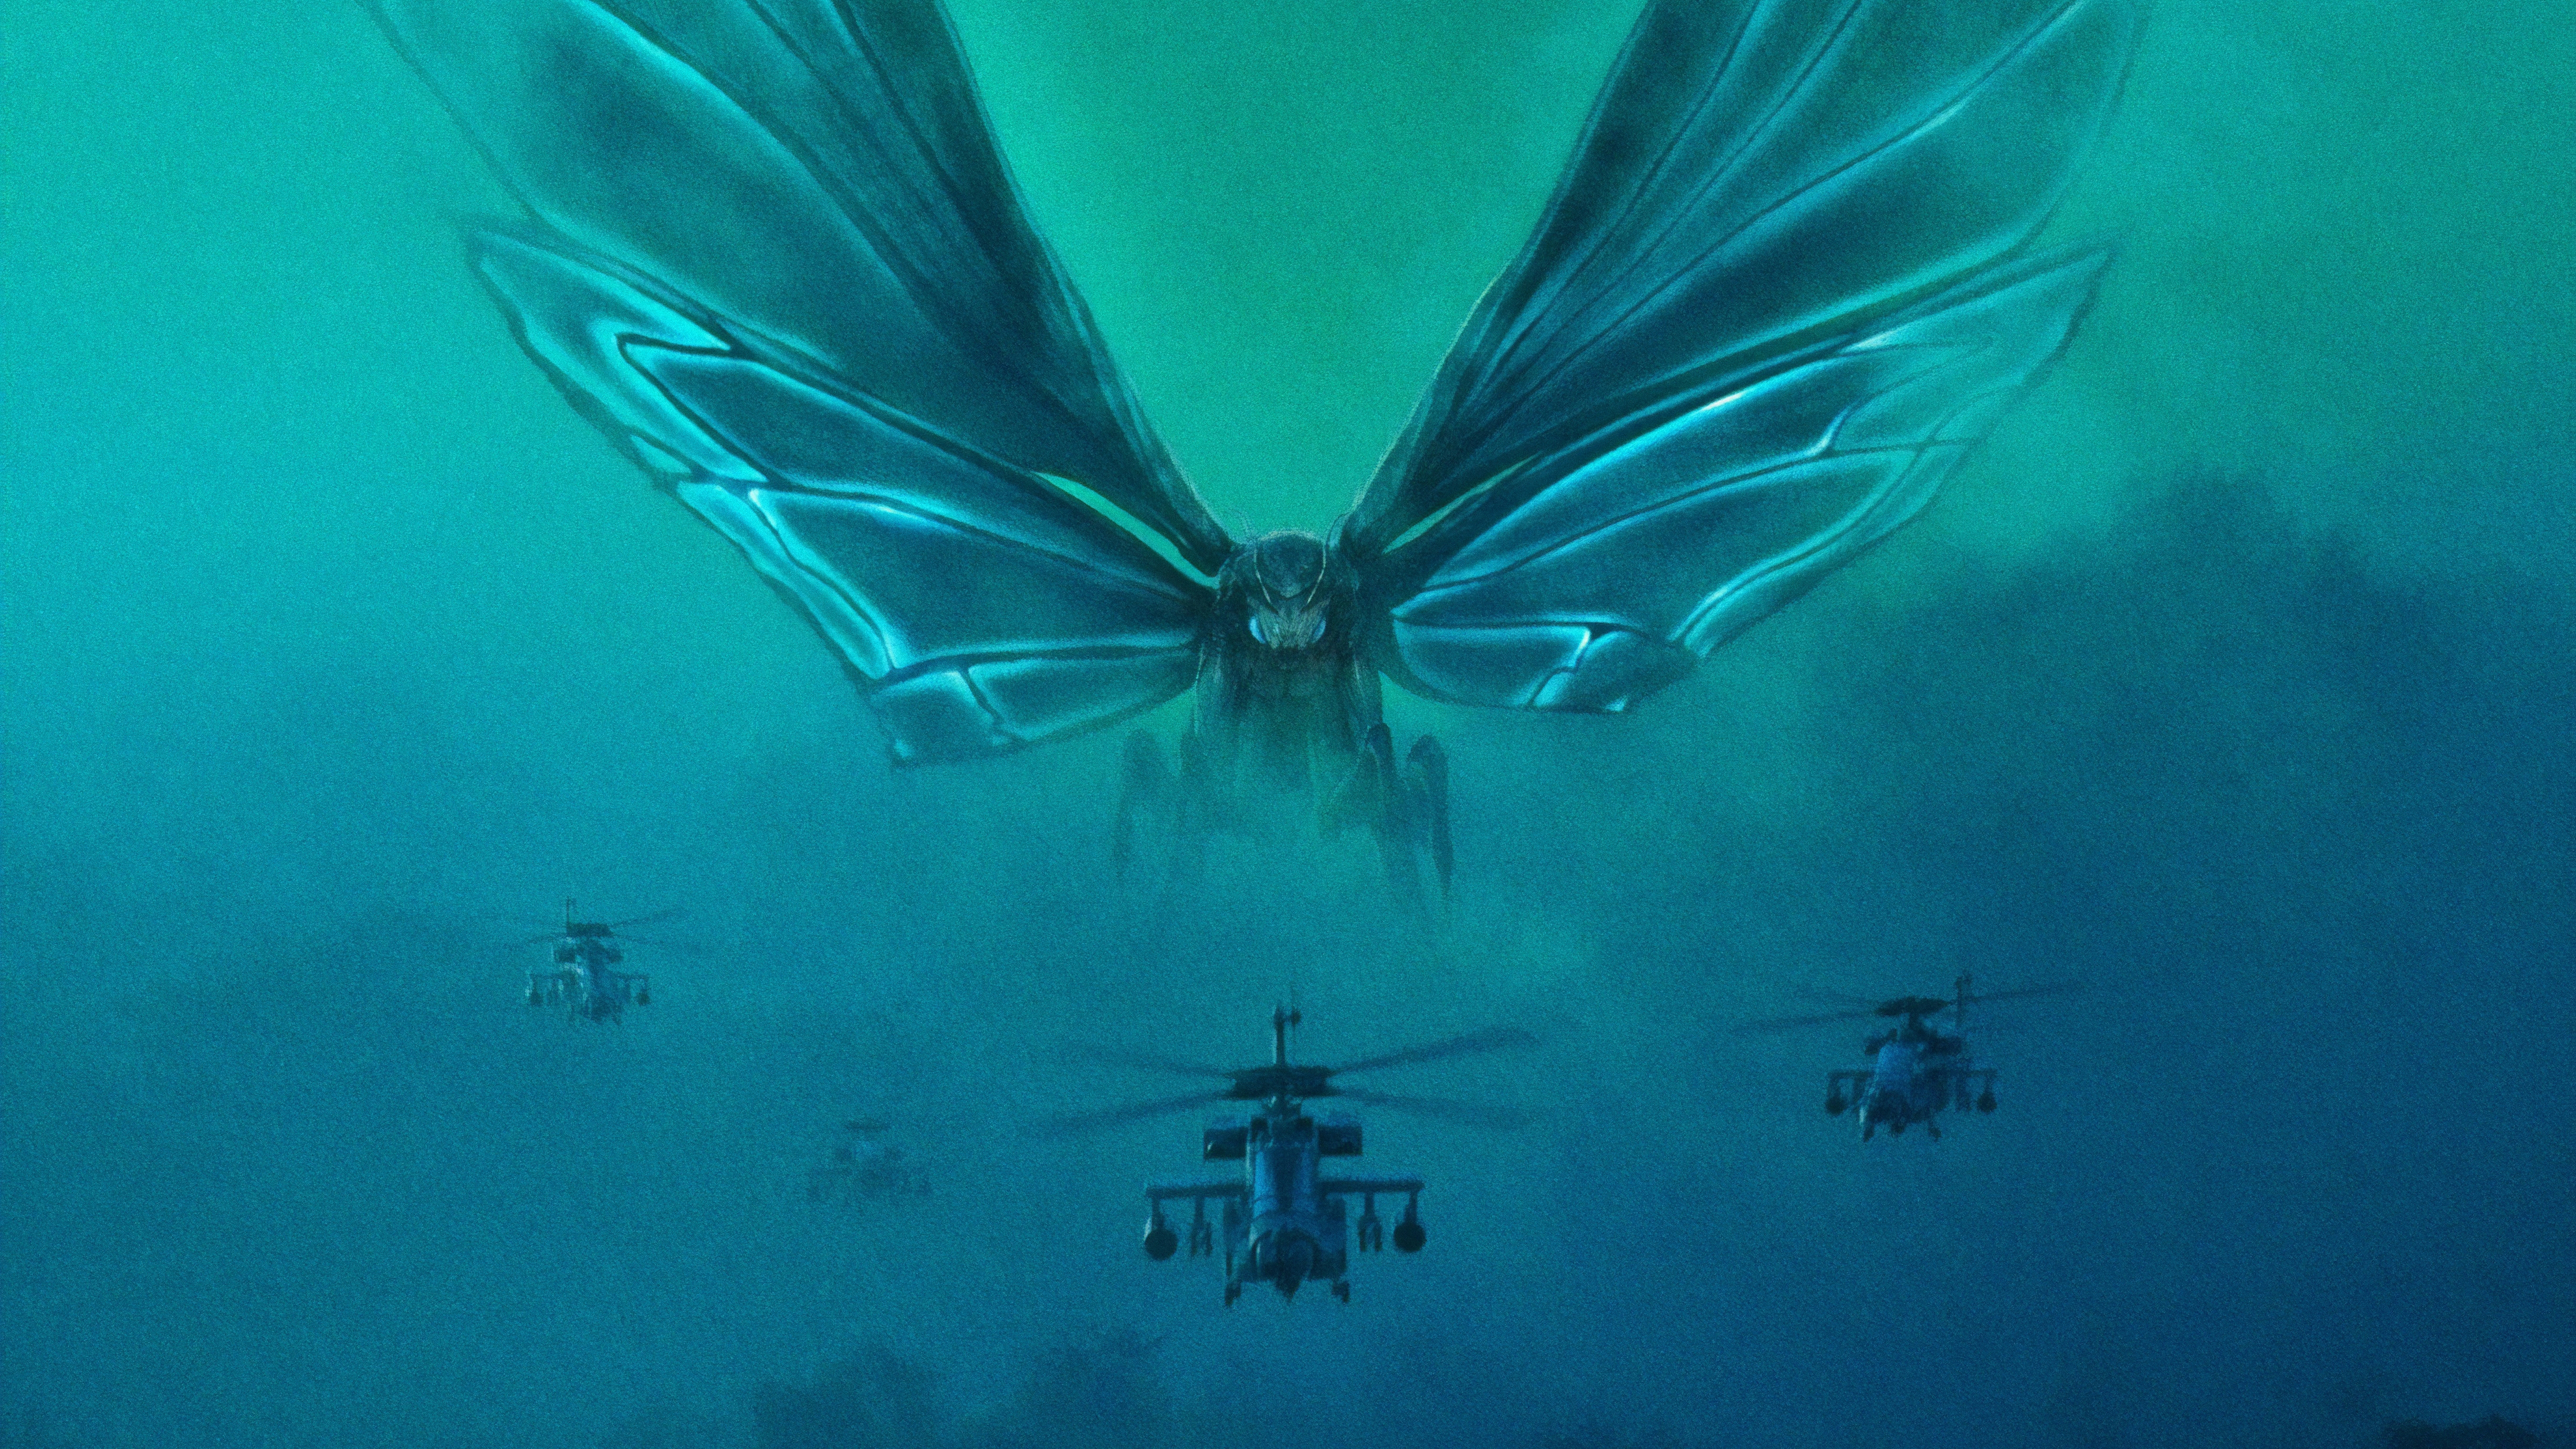 Free Download Mothra Godzilla King Of The Monsters Wallpaper Hd